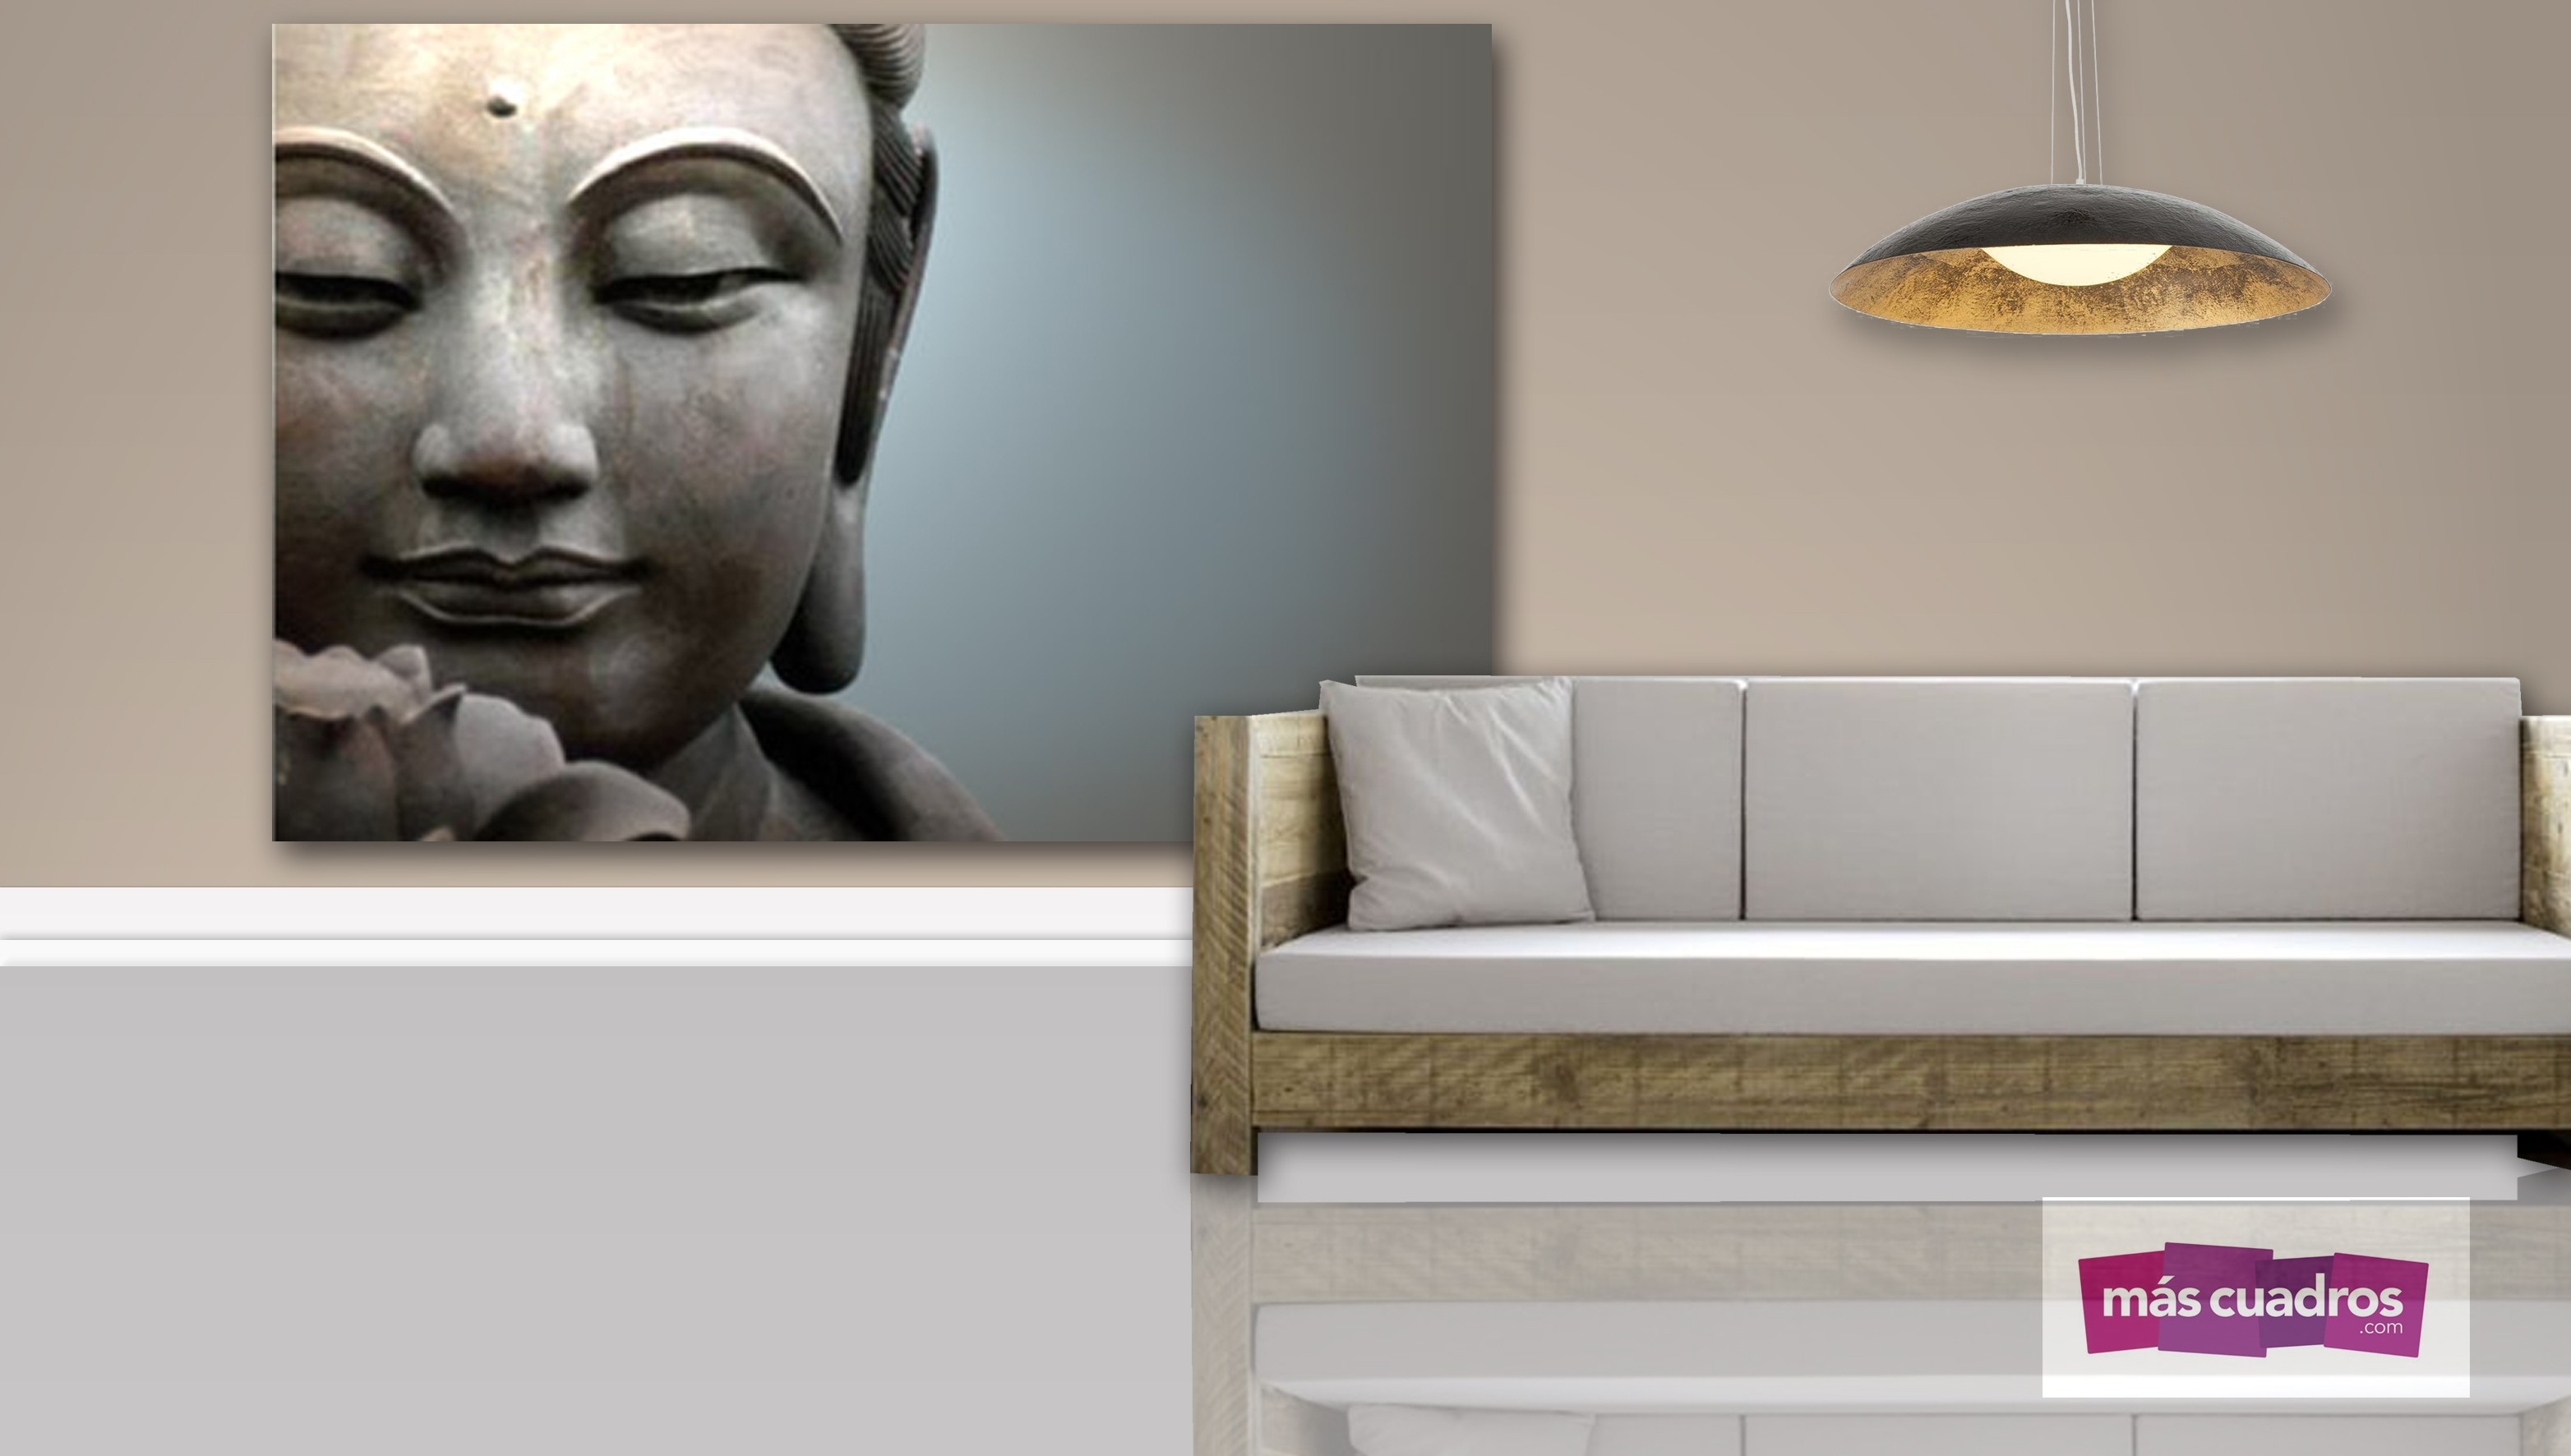 Cuadros zen 4 m s cuadros - Cuadros estilo zen ...